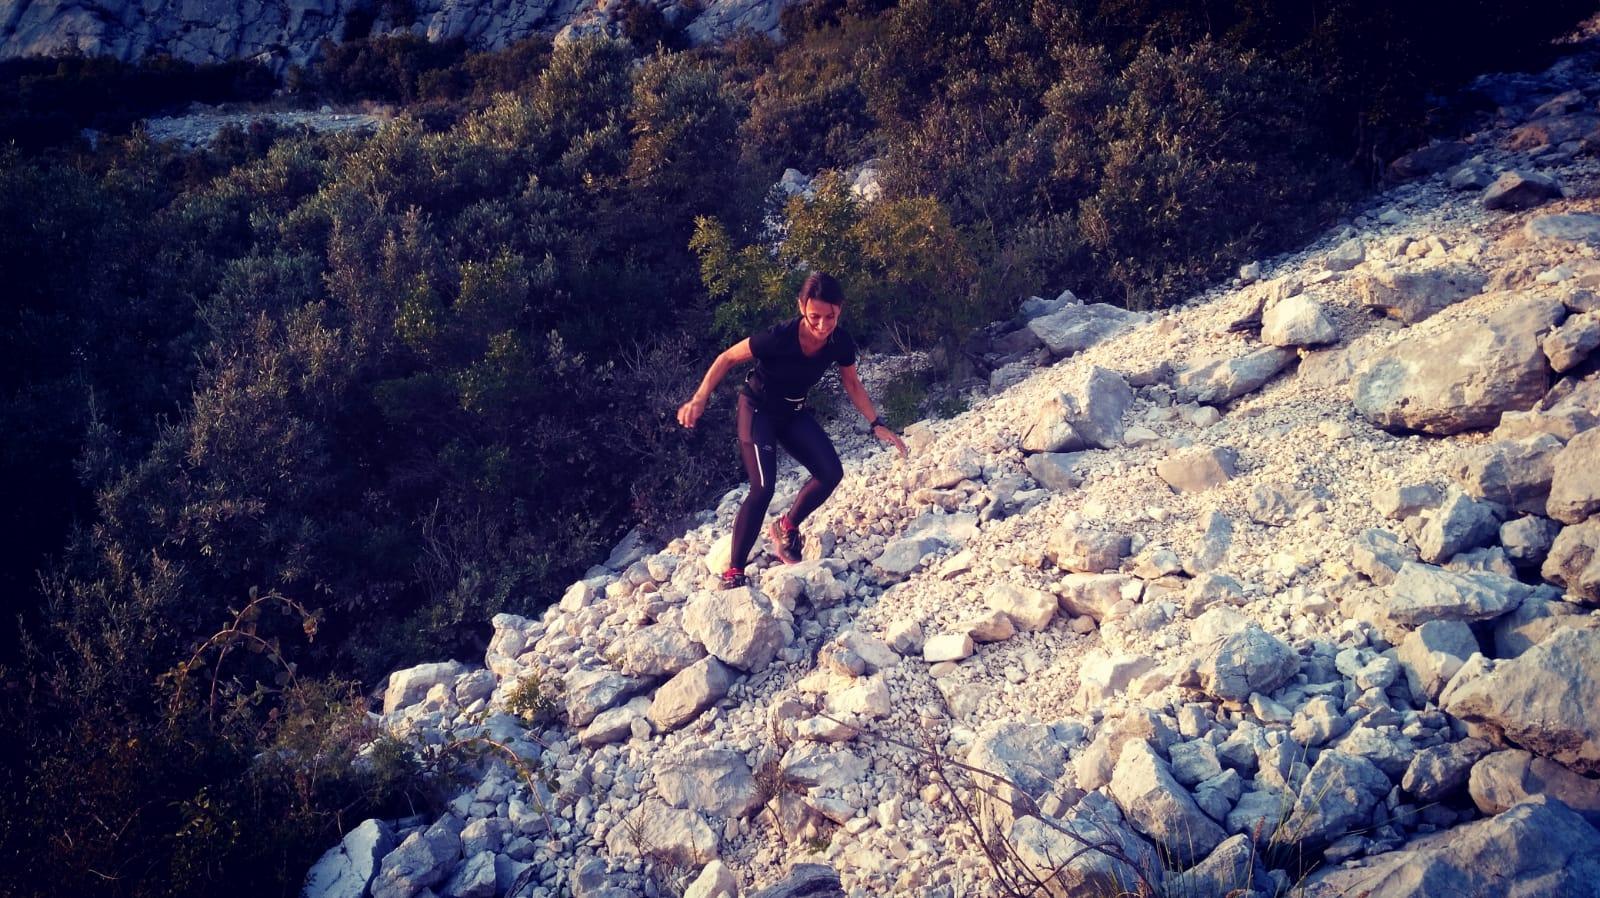 Trenutno pregledavate 19. trening: Malo uspona i puno kamenjara